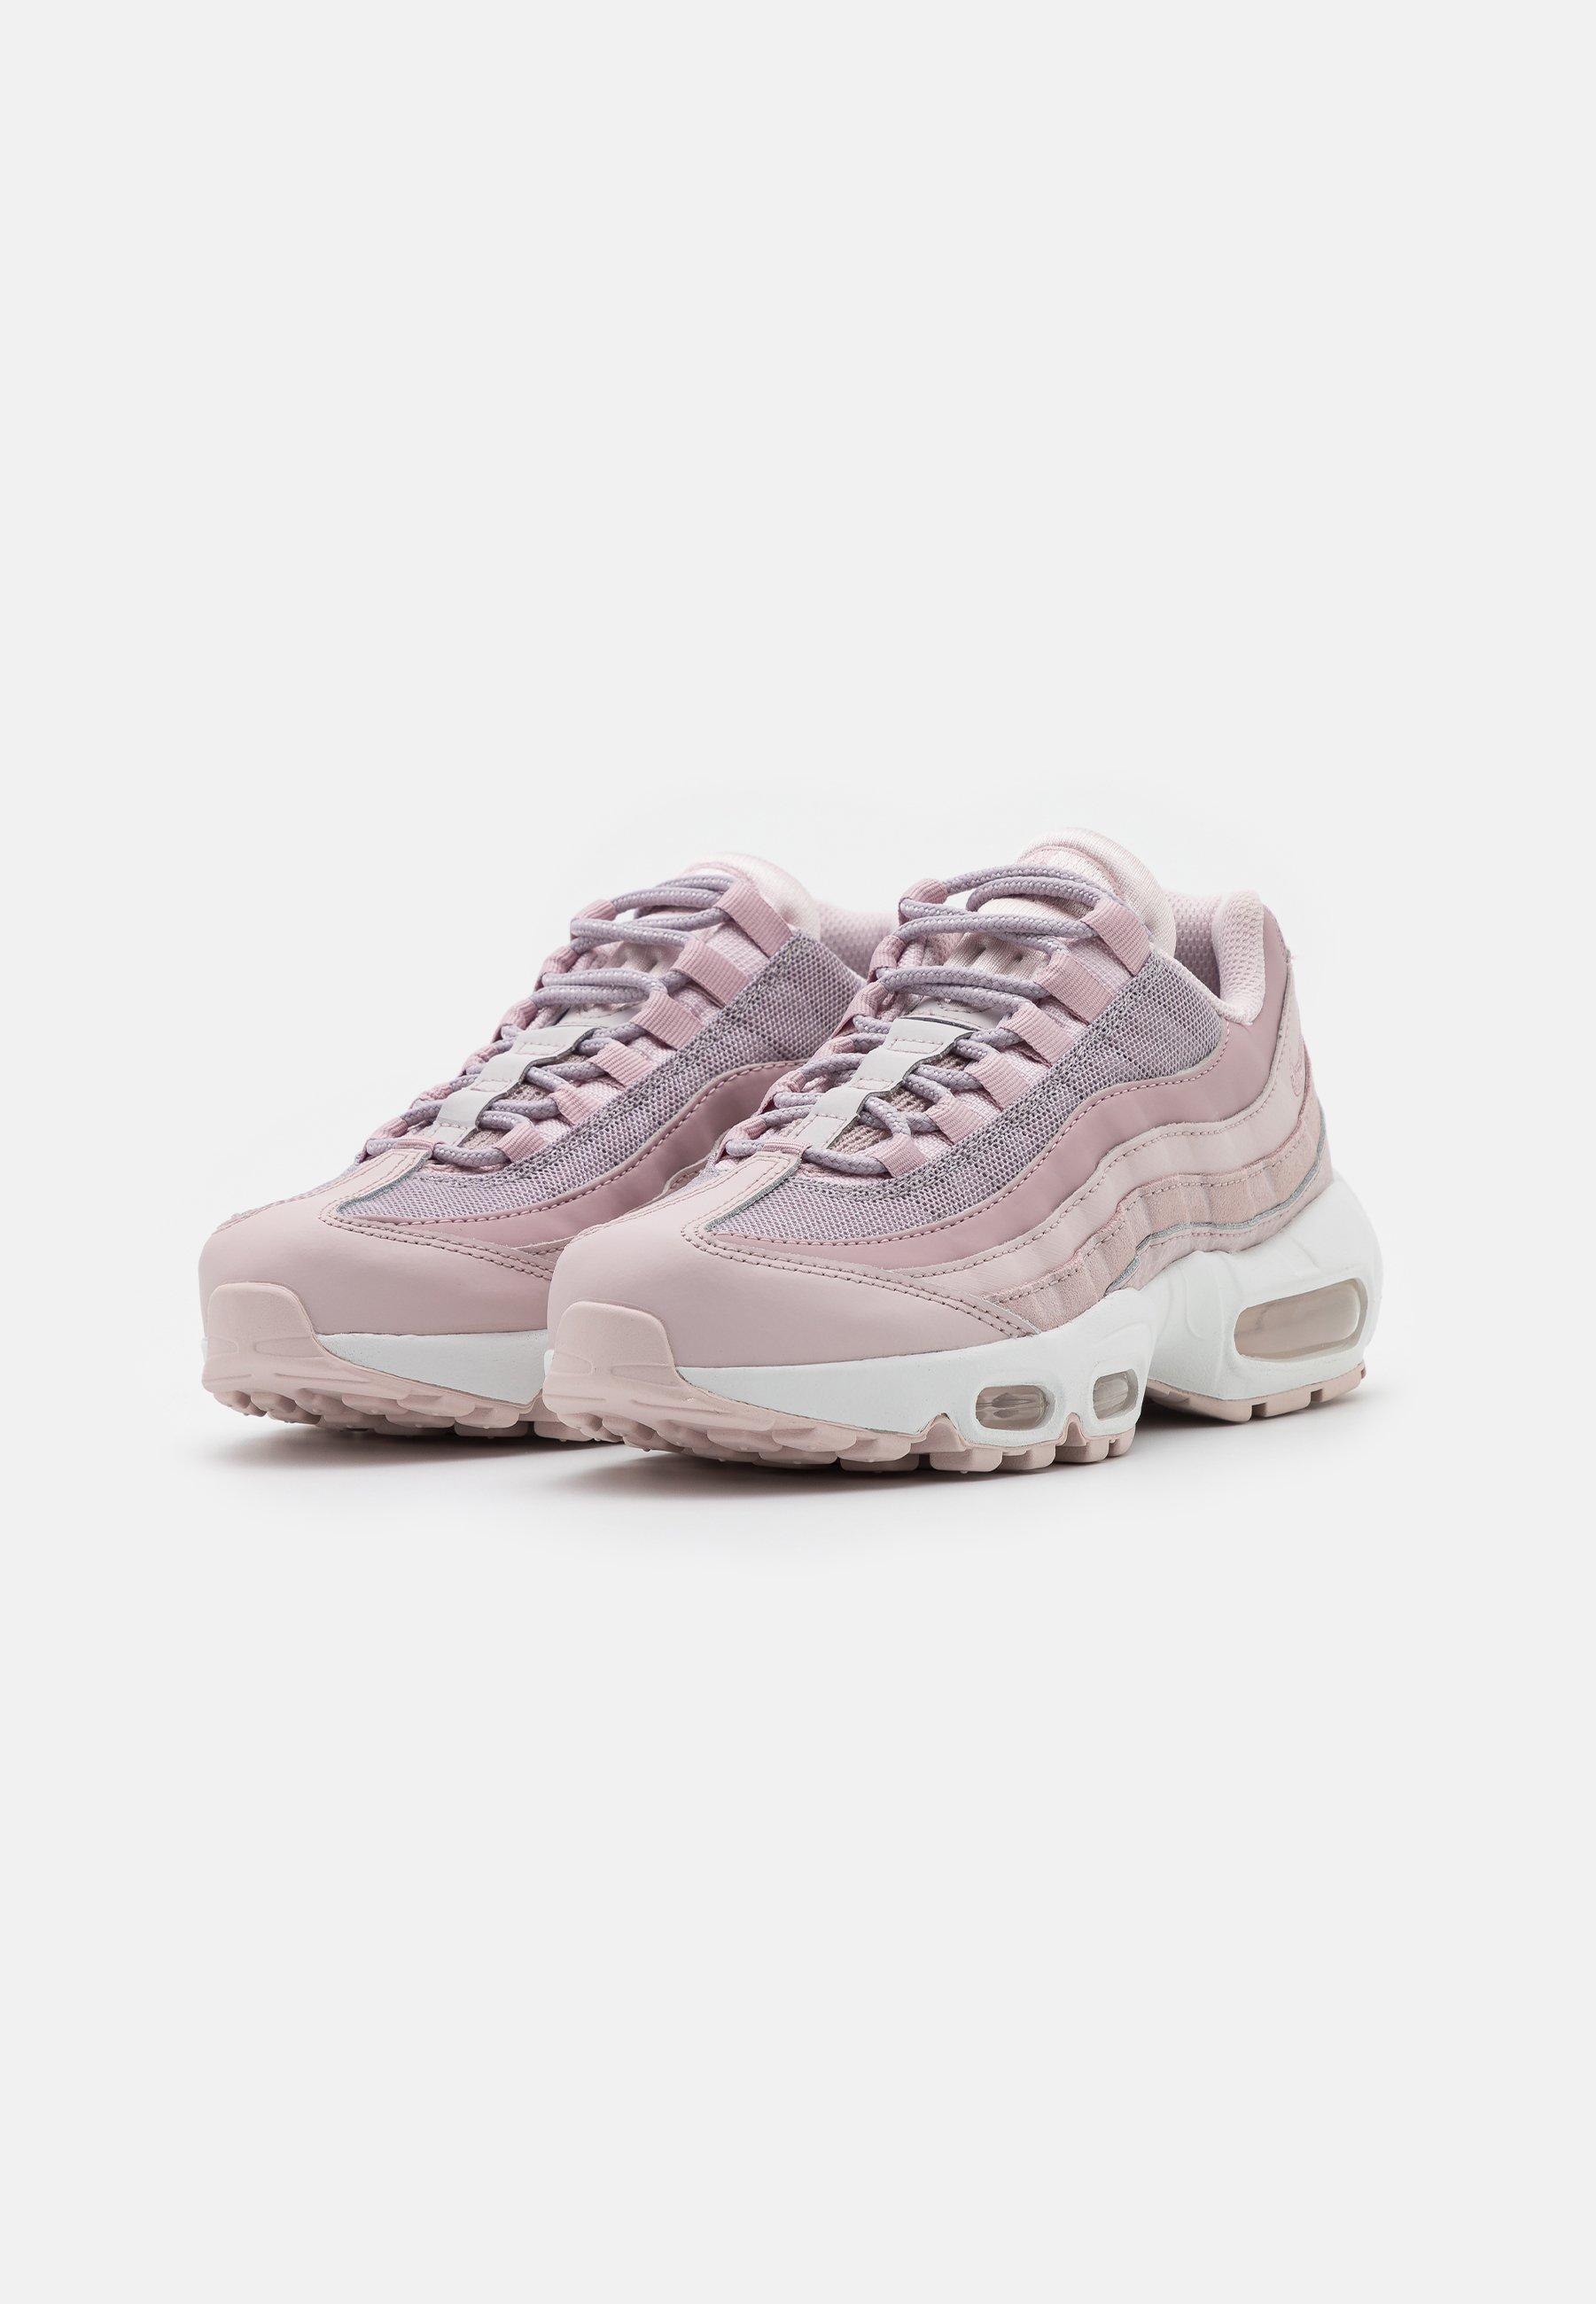 air max 95 bianco rosa